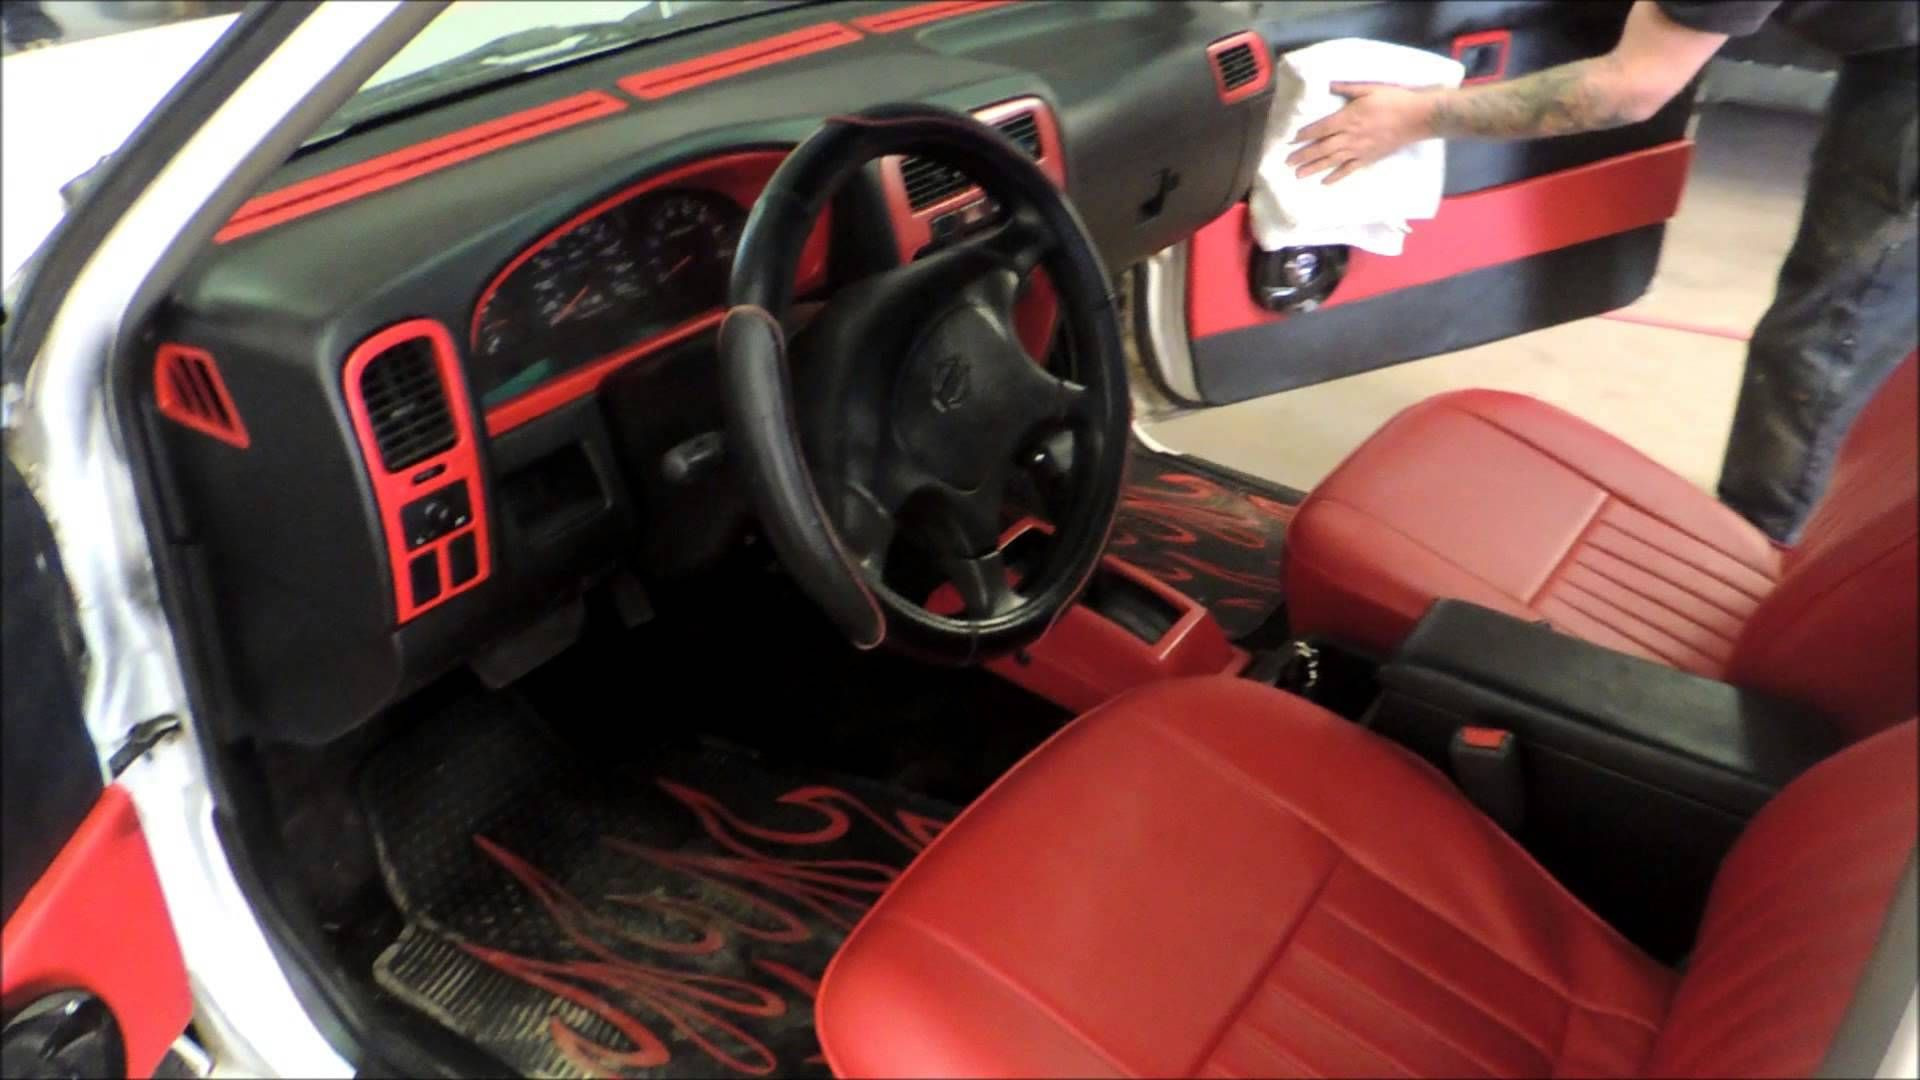 Nissan Hardbody Quot Custom Interior Quot Youtube Nissan Hardbody Nissan Hardbody 4x4 Nissan Trucks